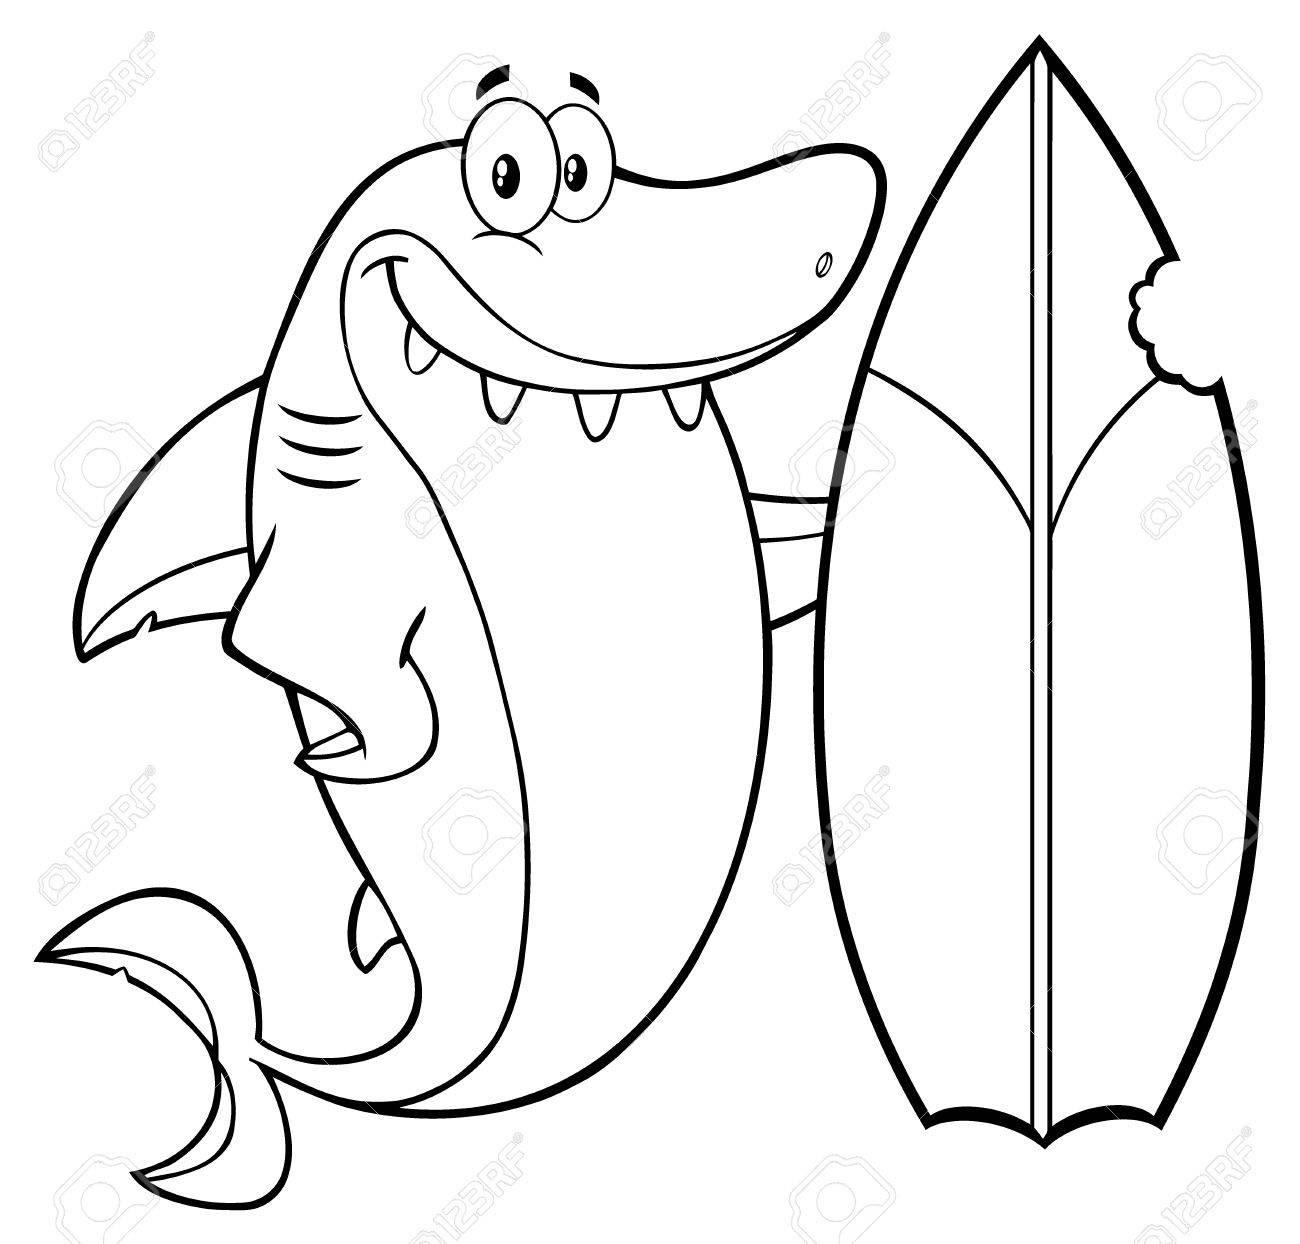 Surfboard Cartoon Drawing at GetDrawings | Free download